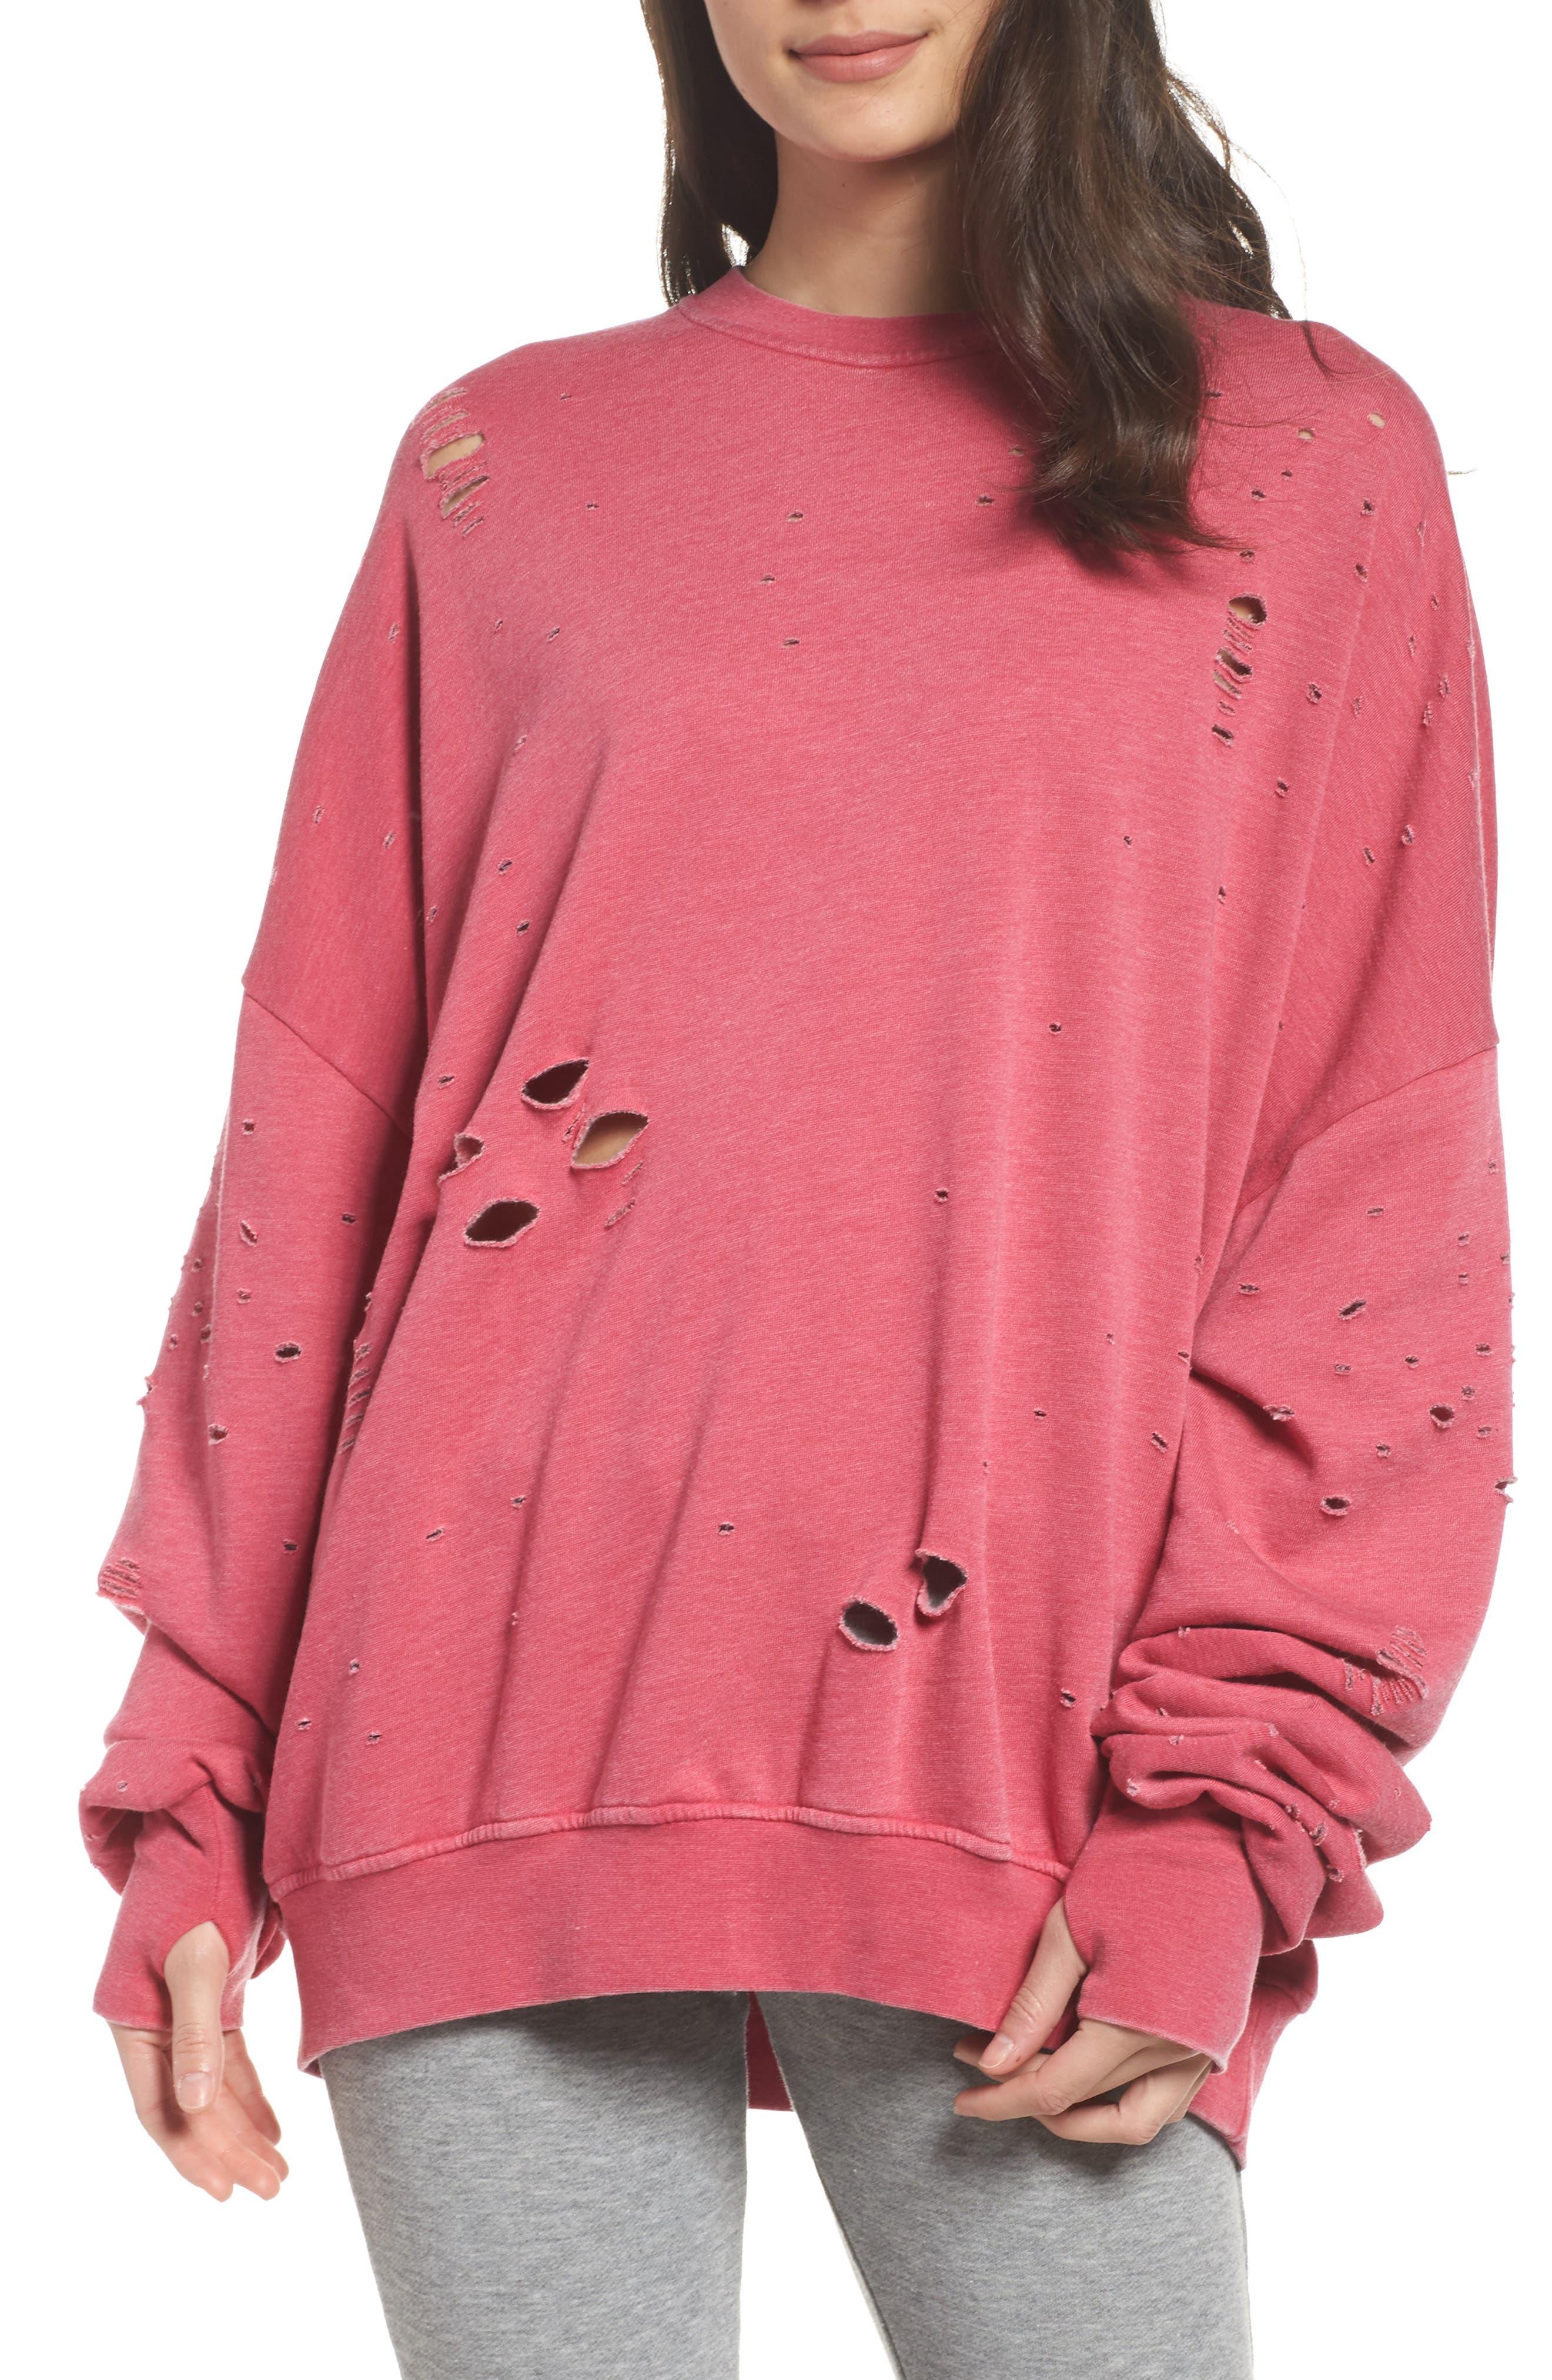 Thrasher Sweatshirt,                             Main thumbnail 1, color,                             Flamingo